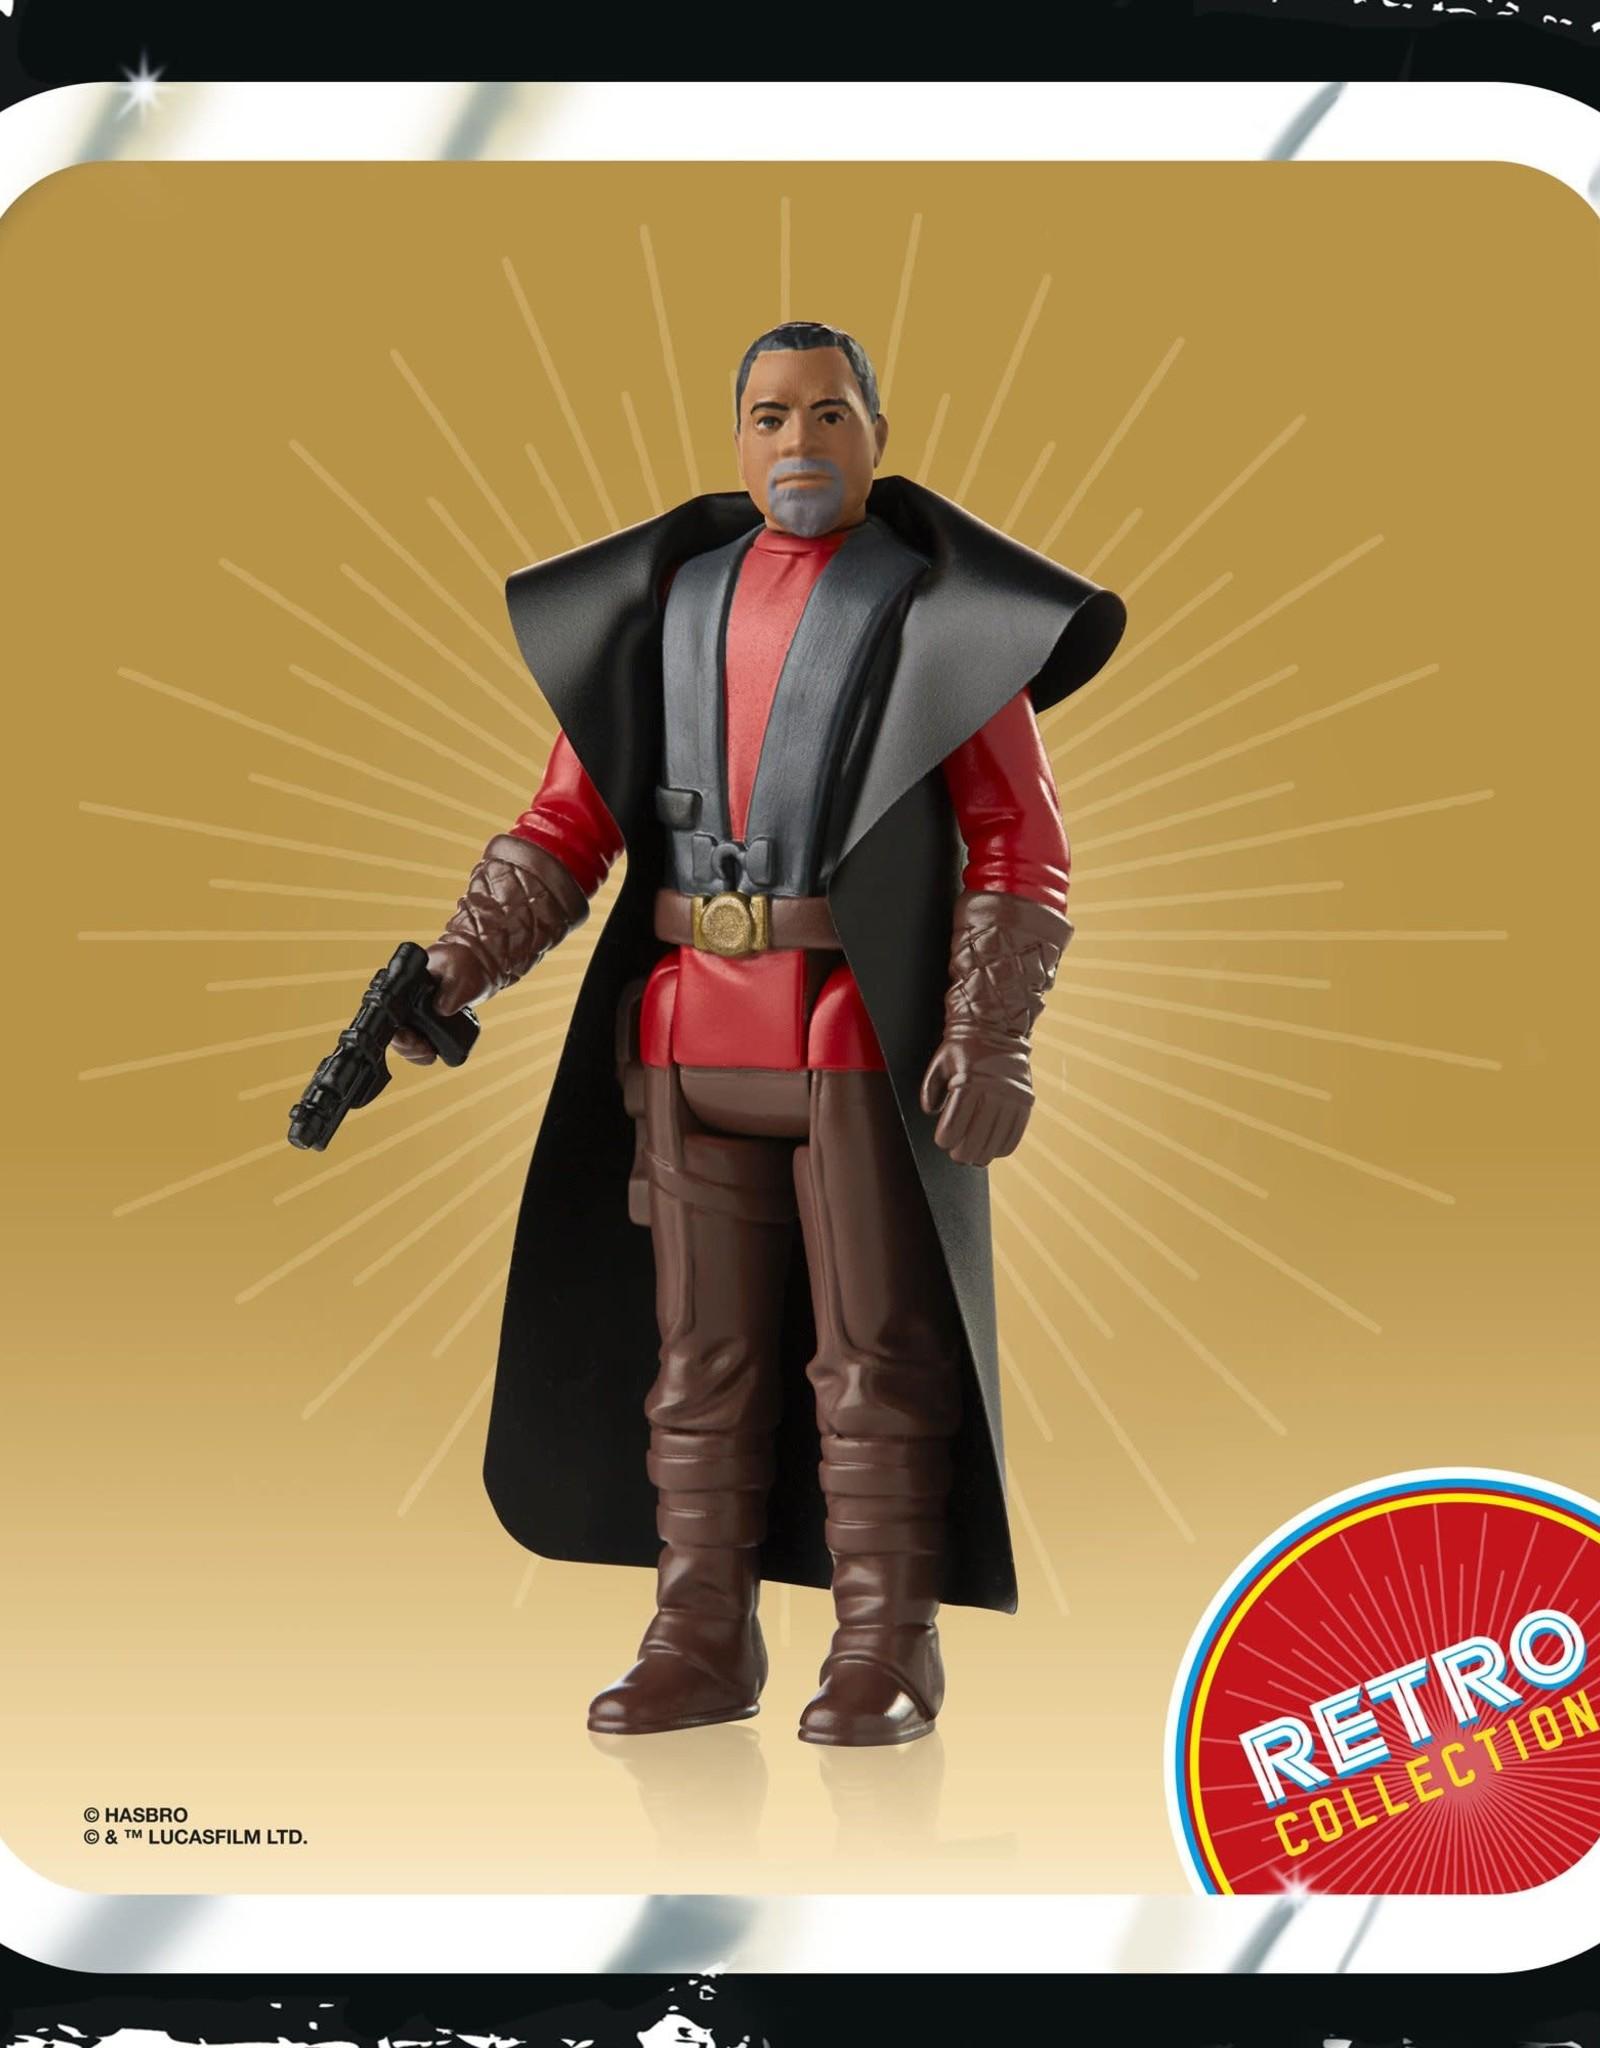 HASBRO The Retro Collection: Greef Karga (2020)